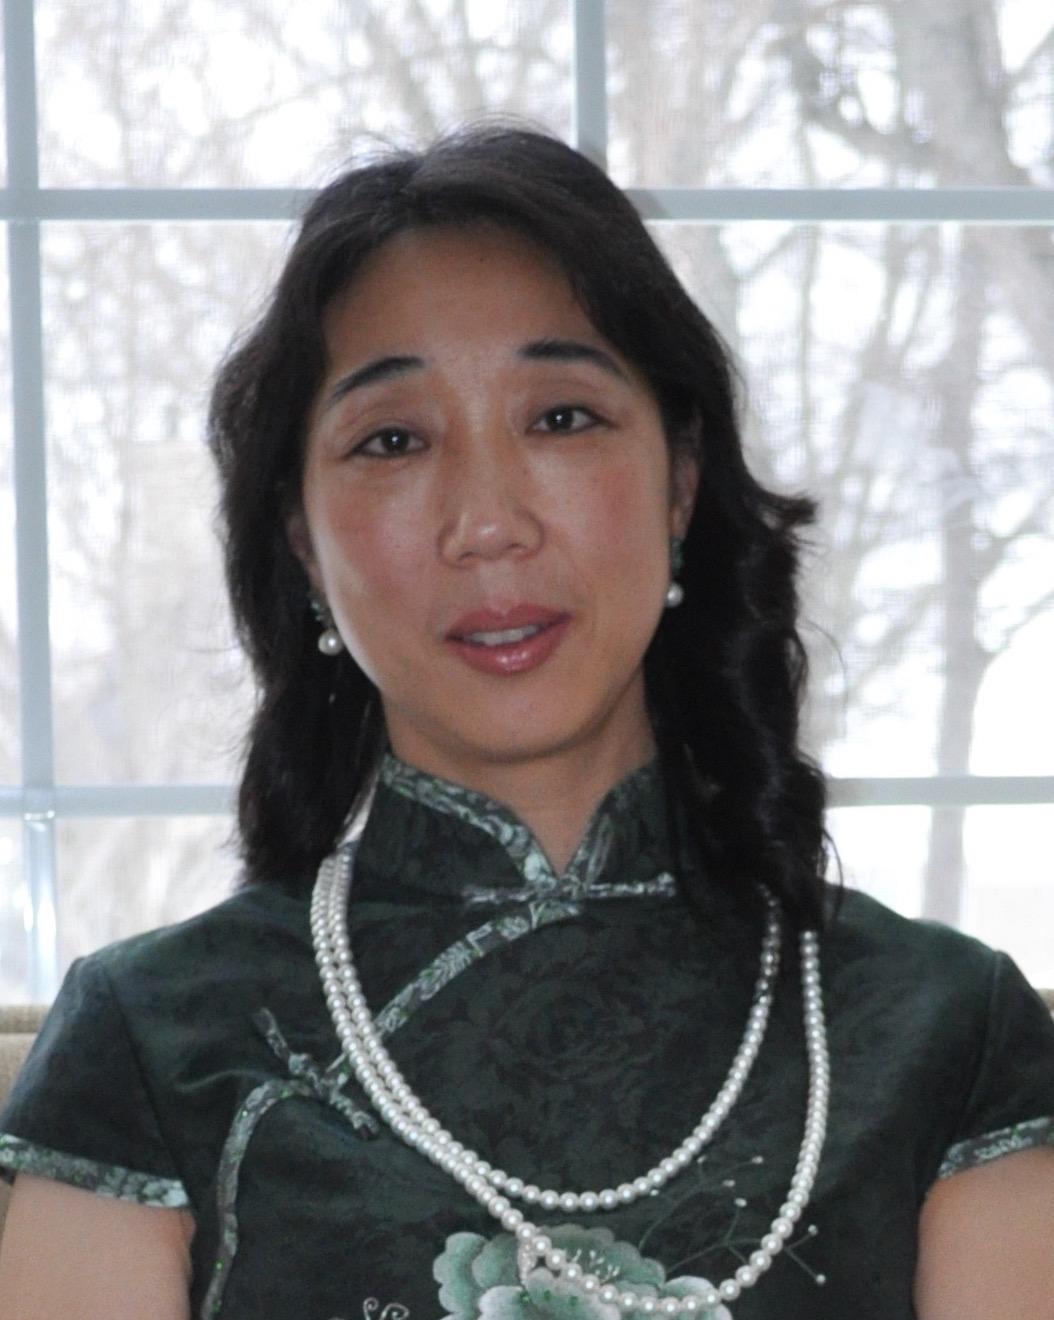 Chaoyu Xie